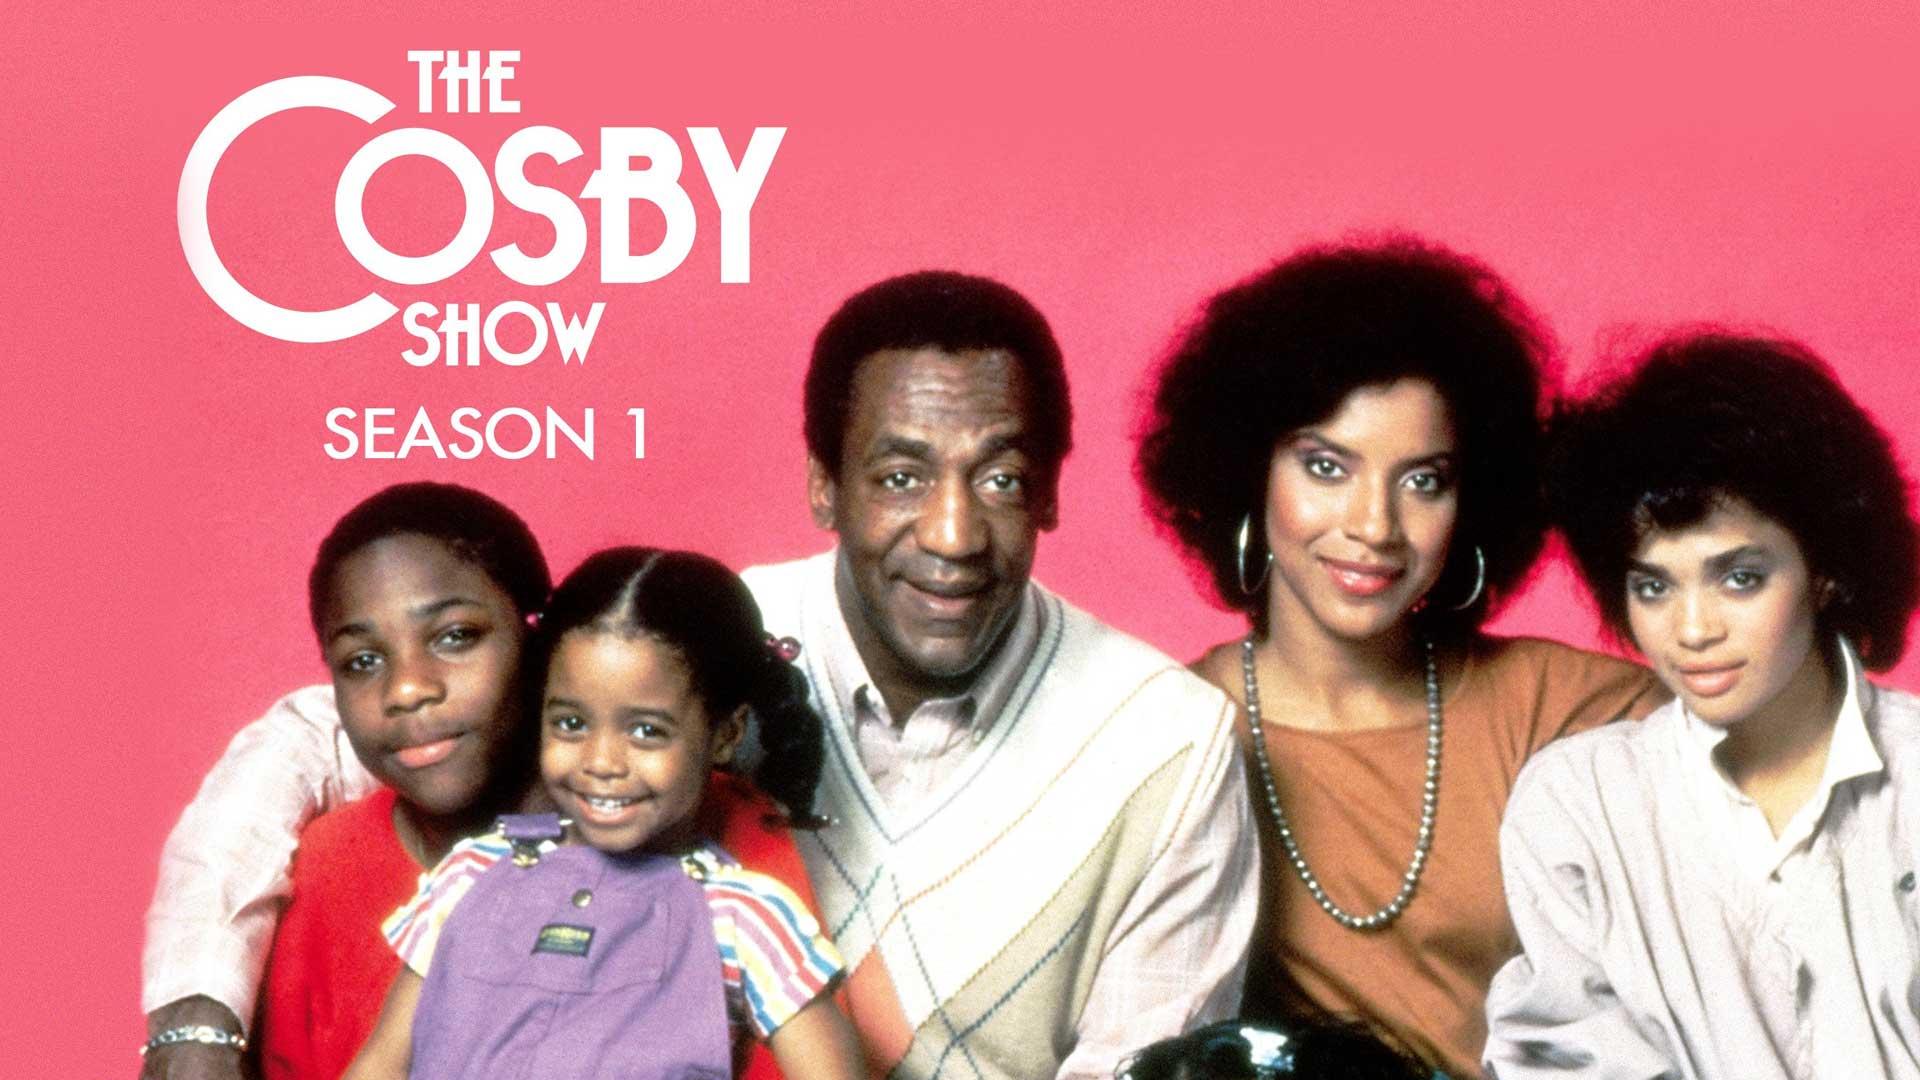 The Cosby Show Season 1